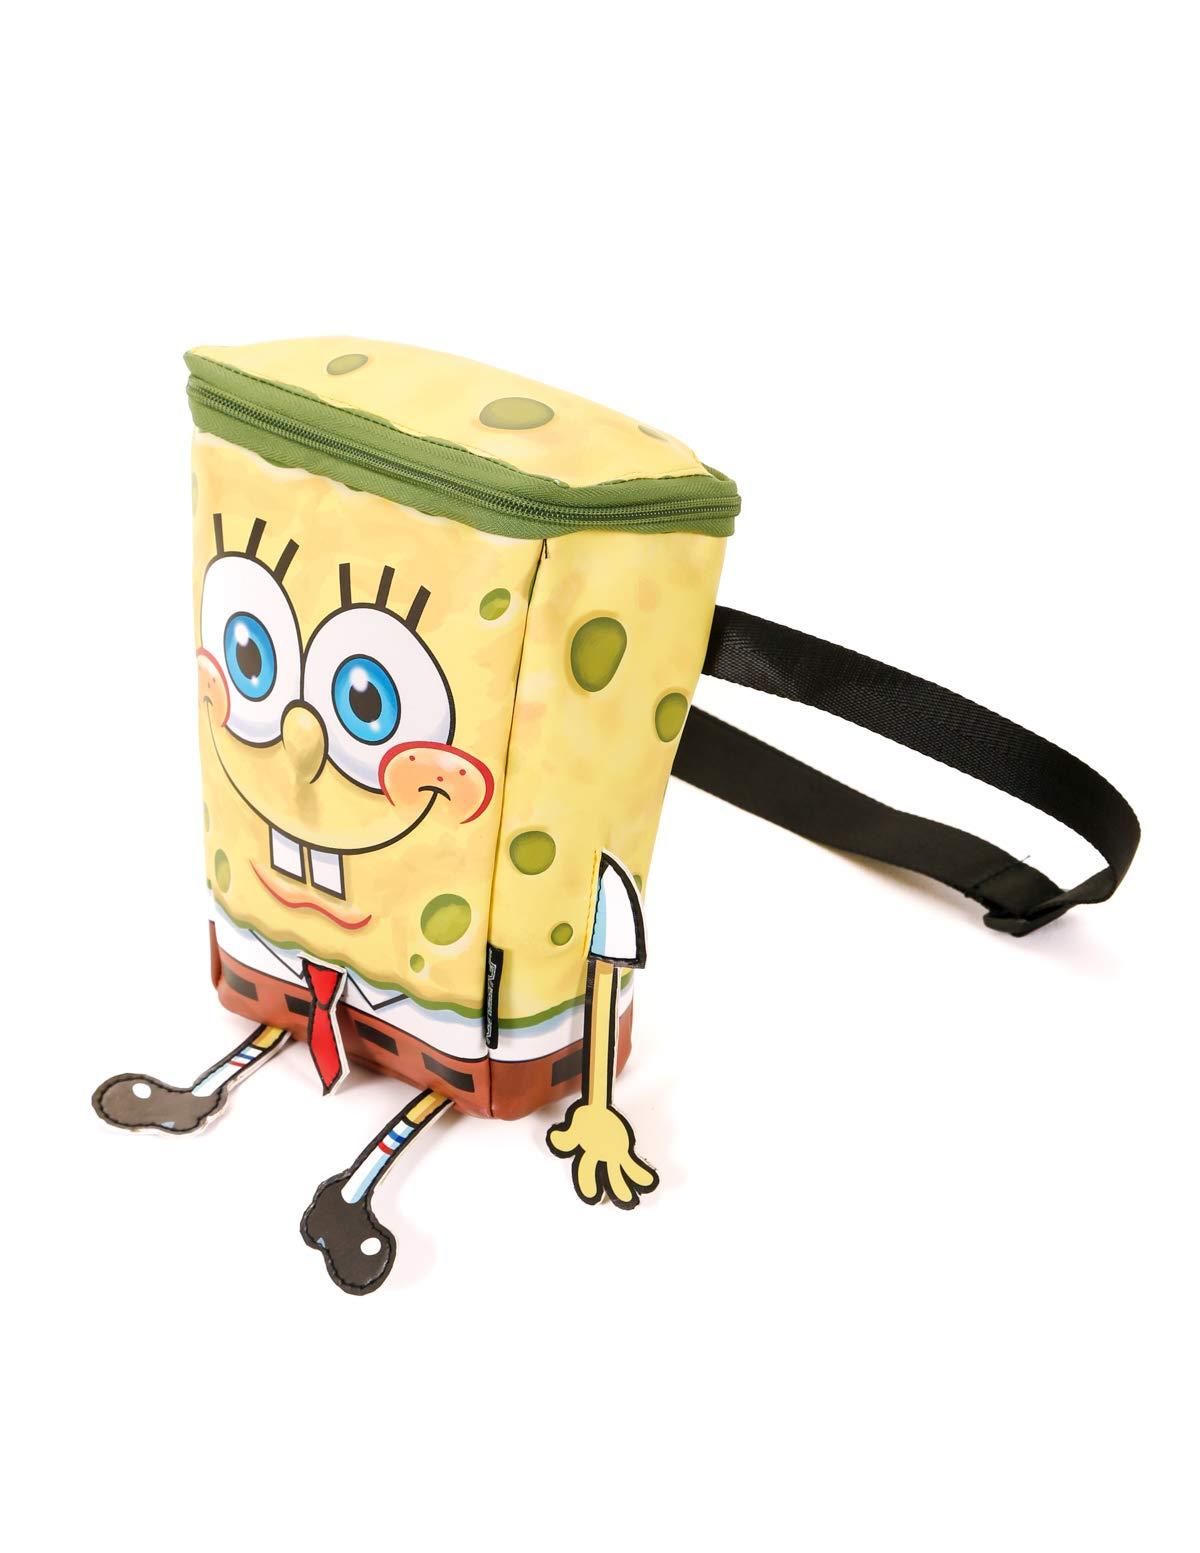 FYDELITY- Kid Backpack Cooler Lunch Box: NICK Nickelodeon 90's SpongeBob Square